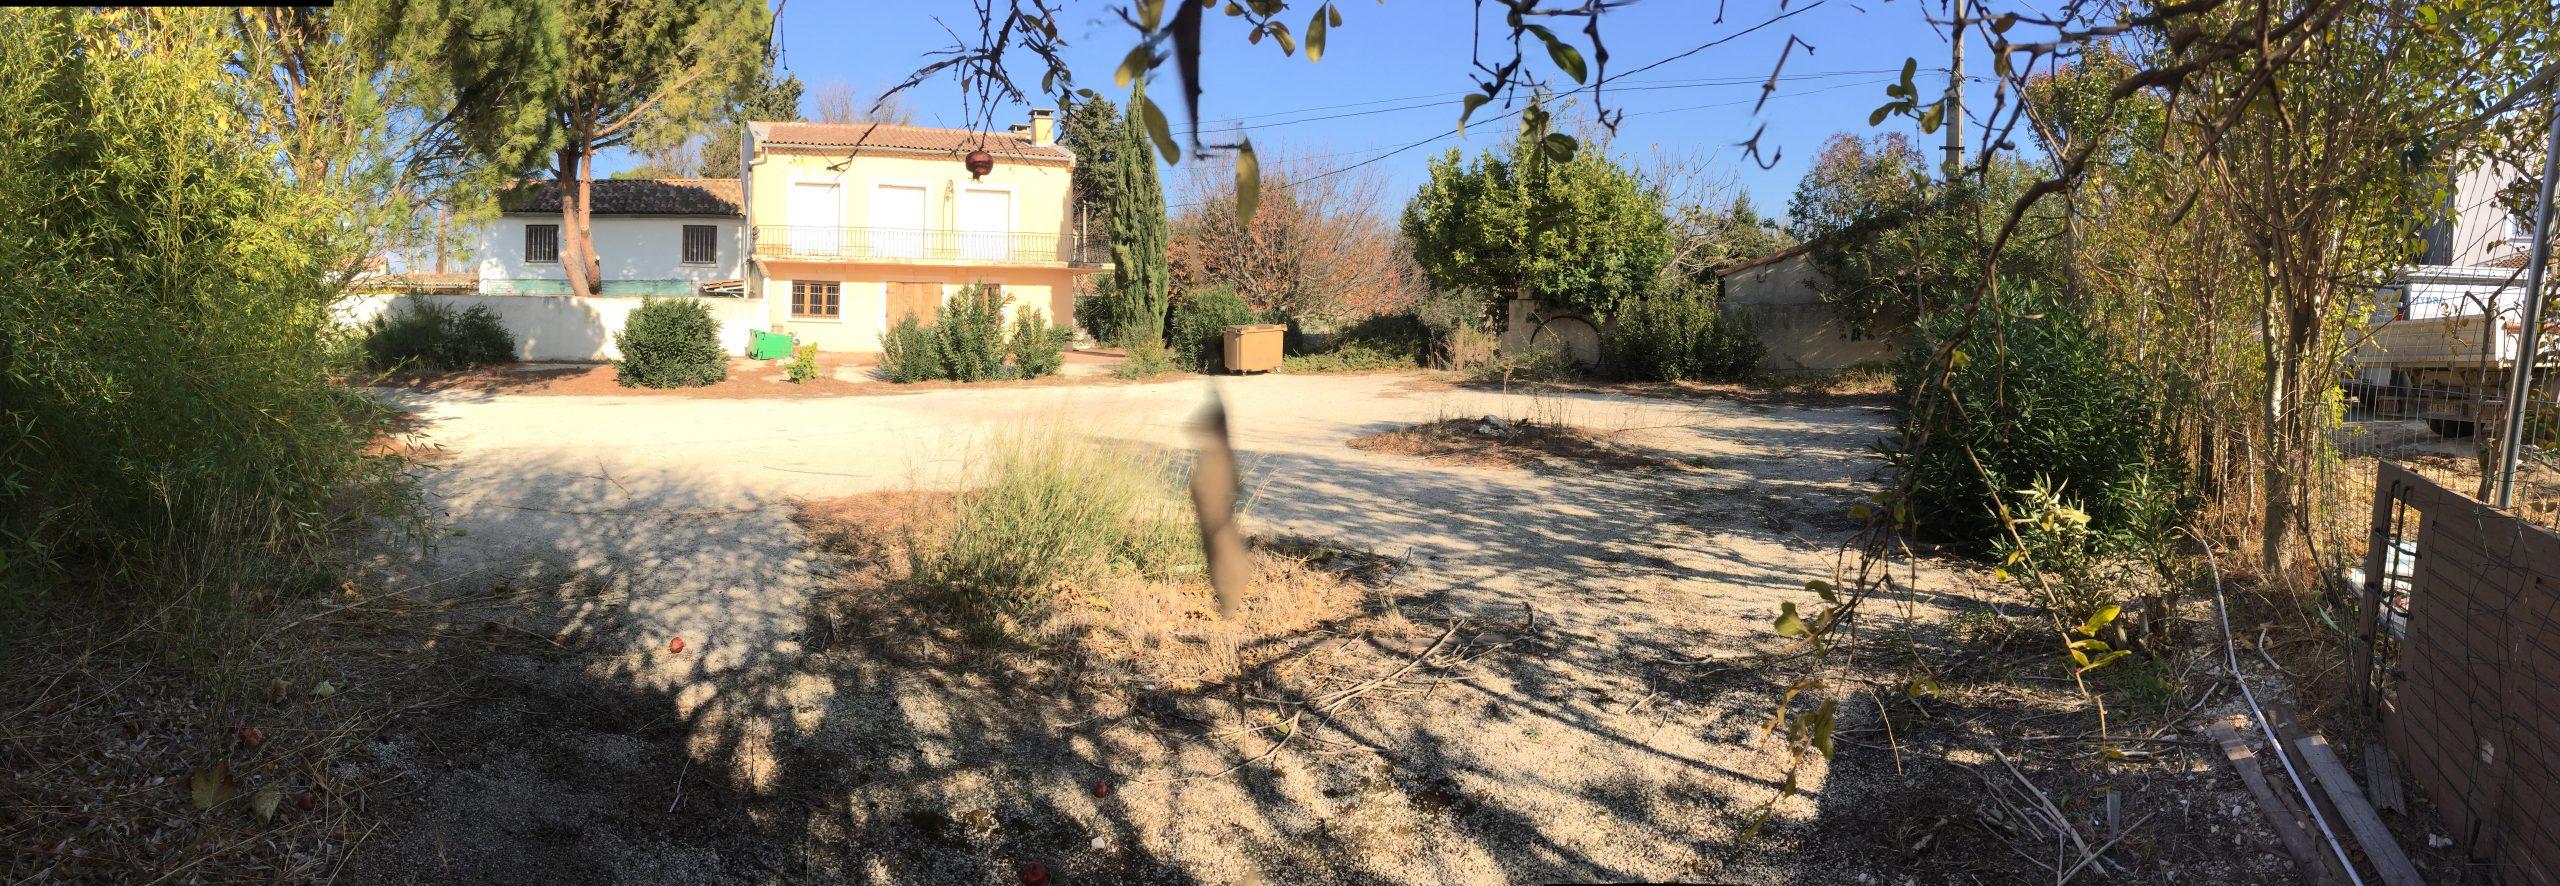 construction habitation en Avignon permis de construire ABE Project